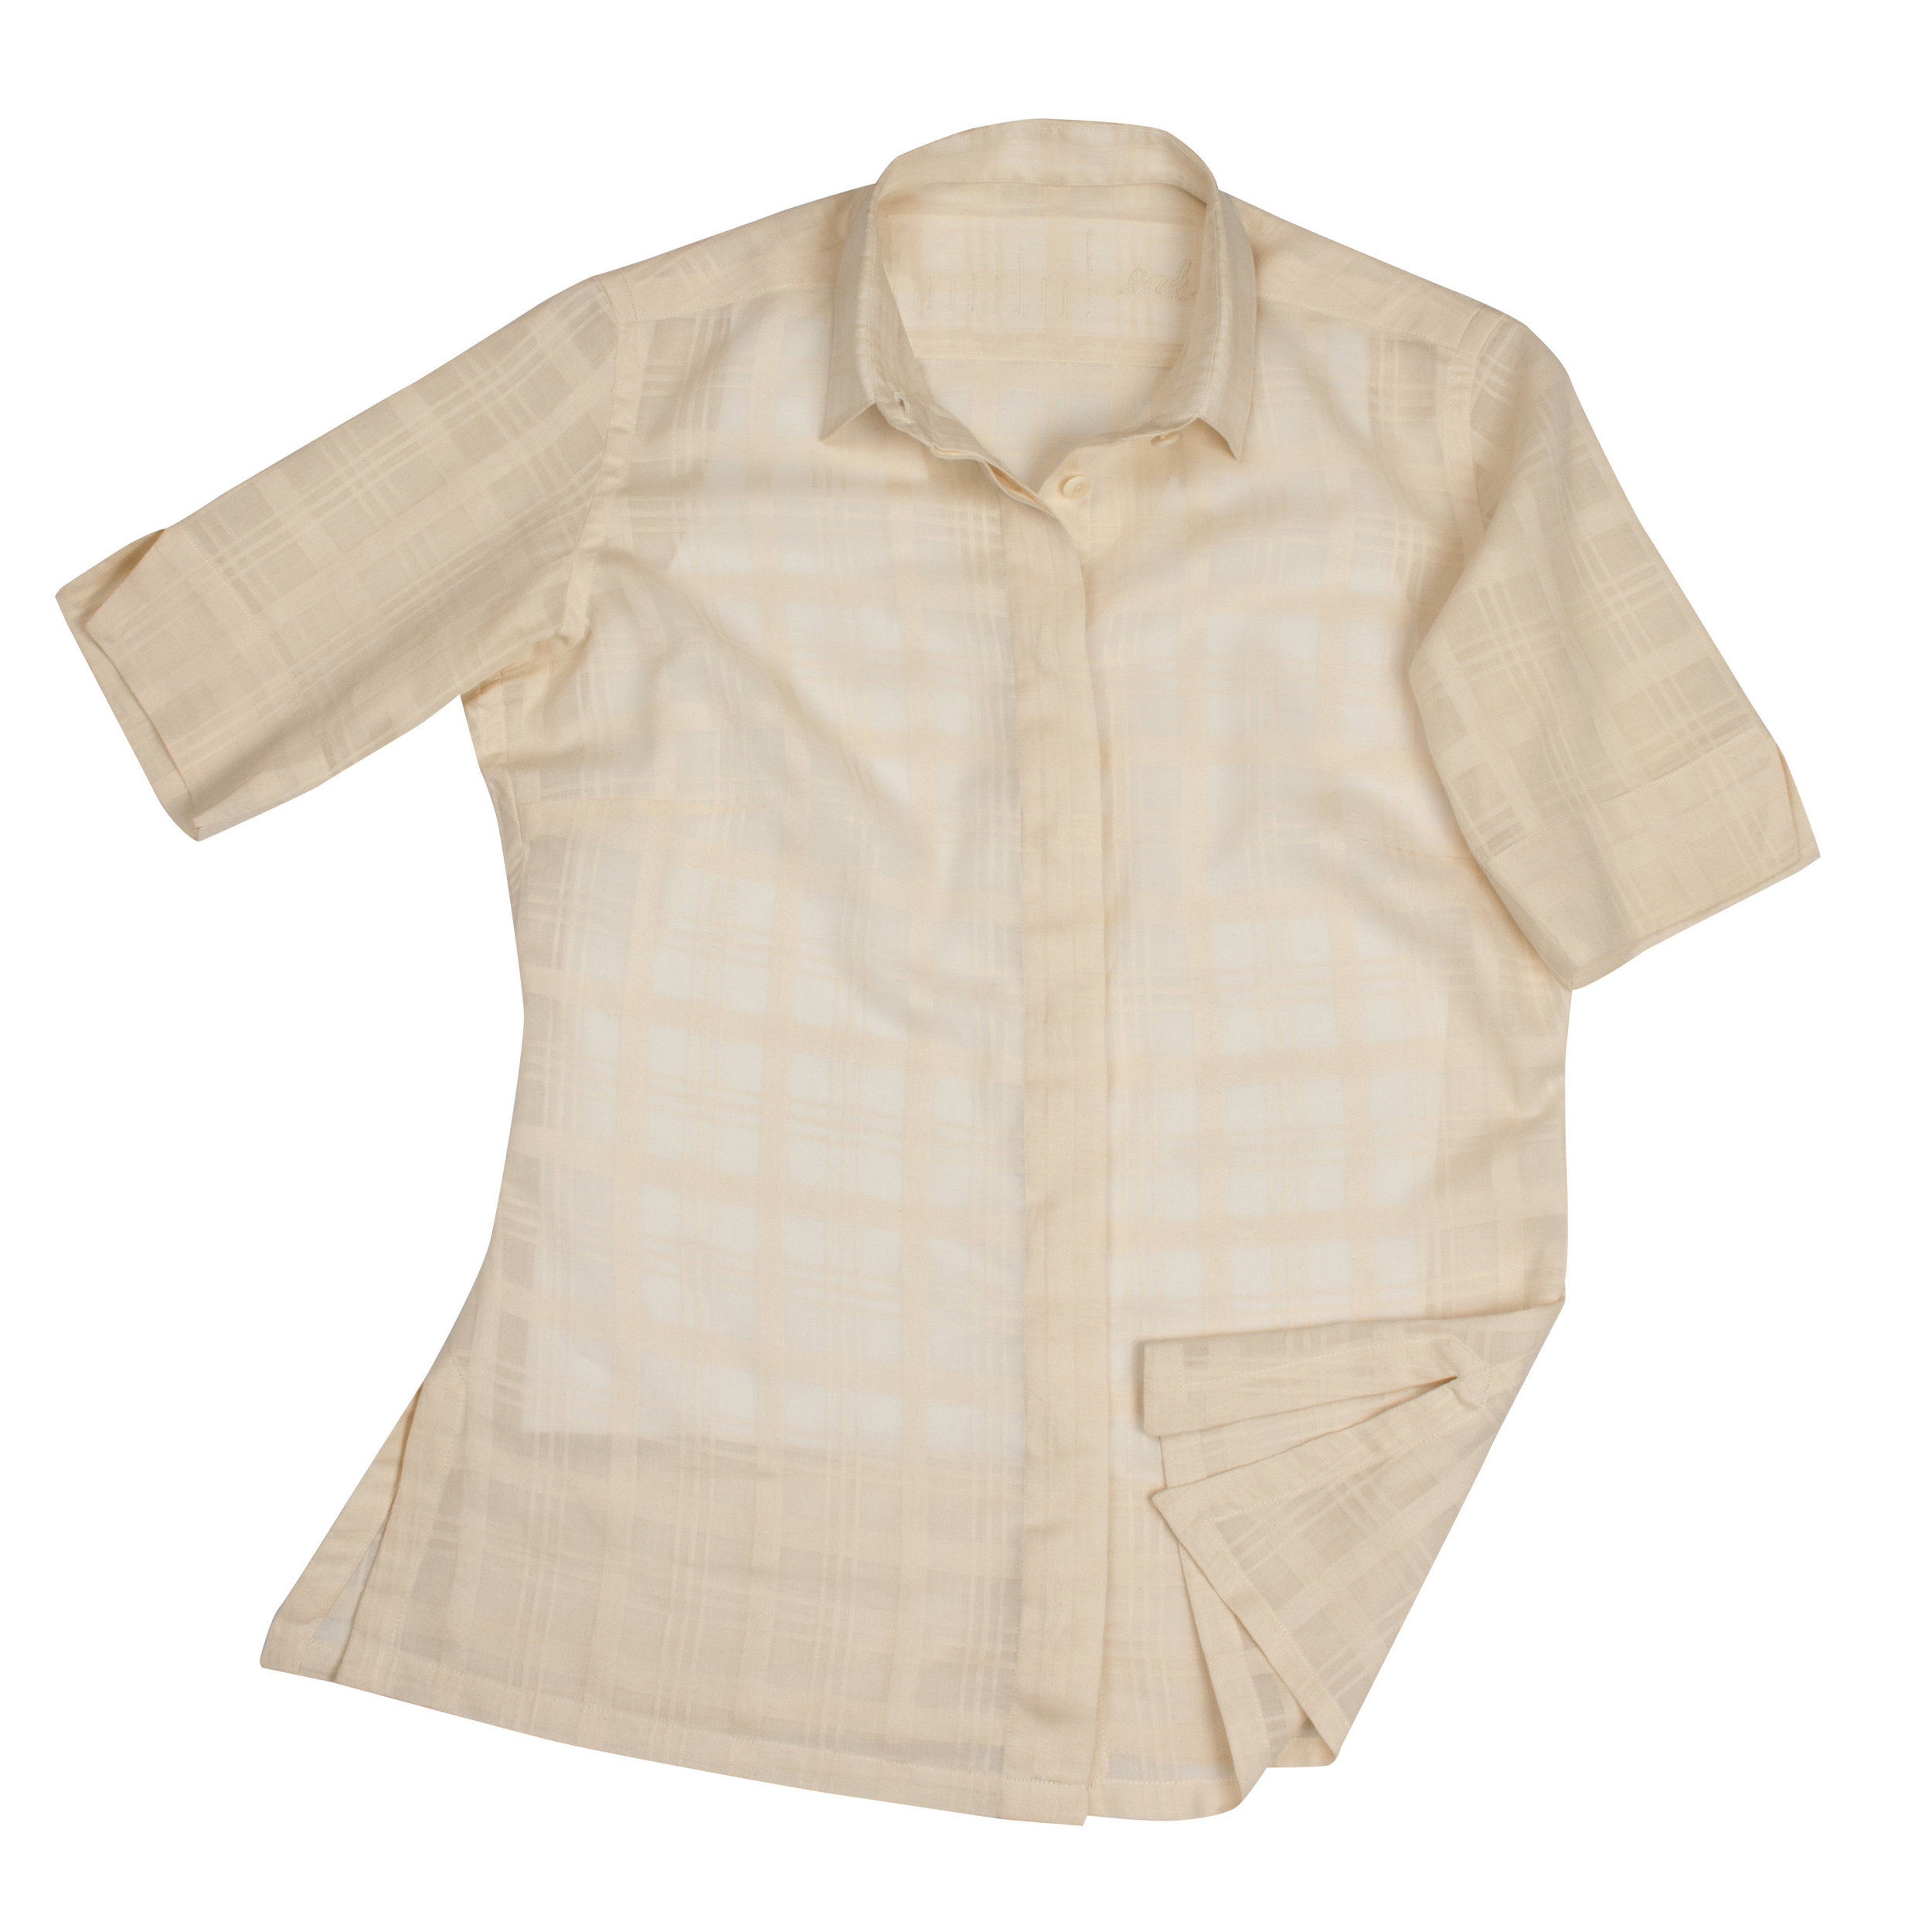 Sunshatter shirt   R2290